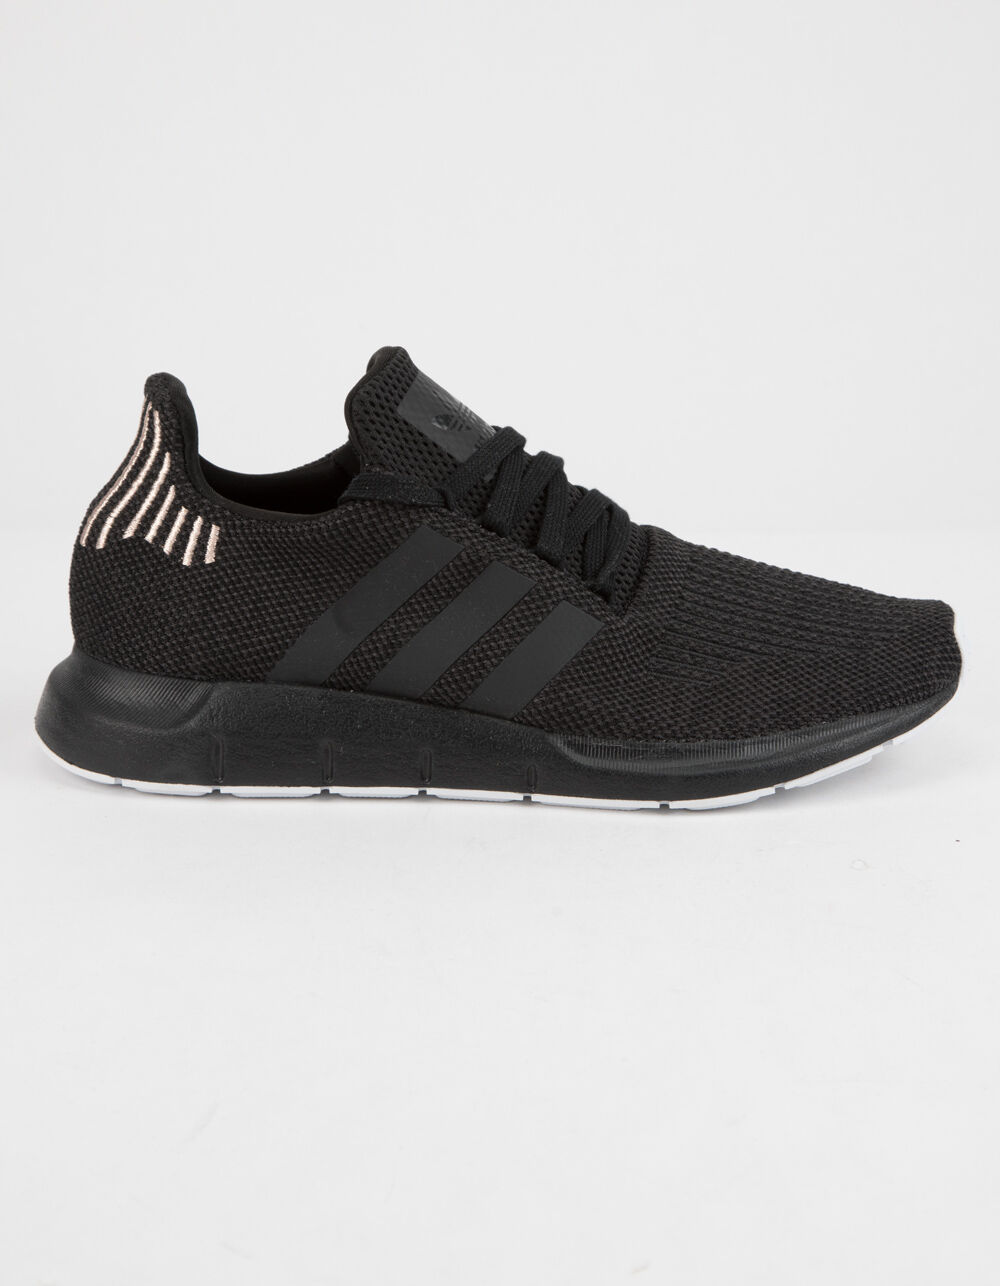 ADIDAS Swift Run Core Black & Carbon Shoes